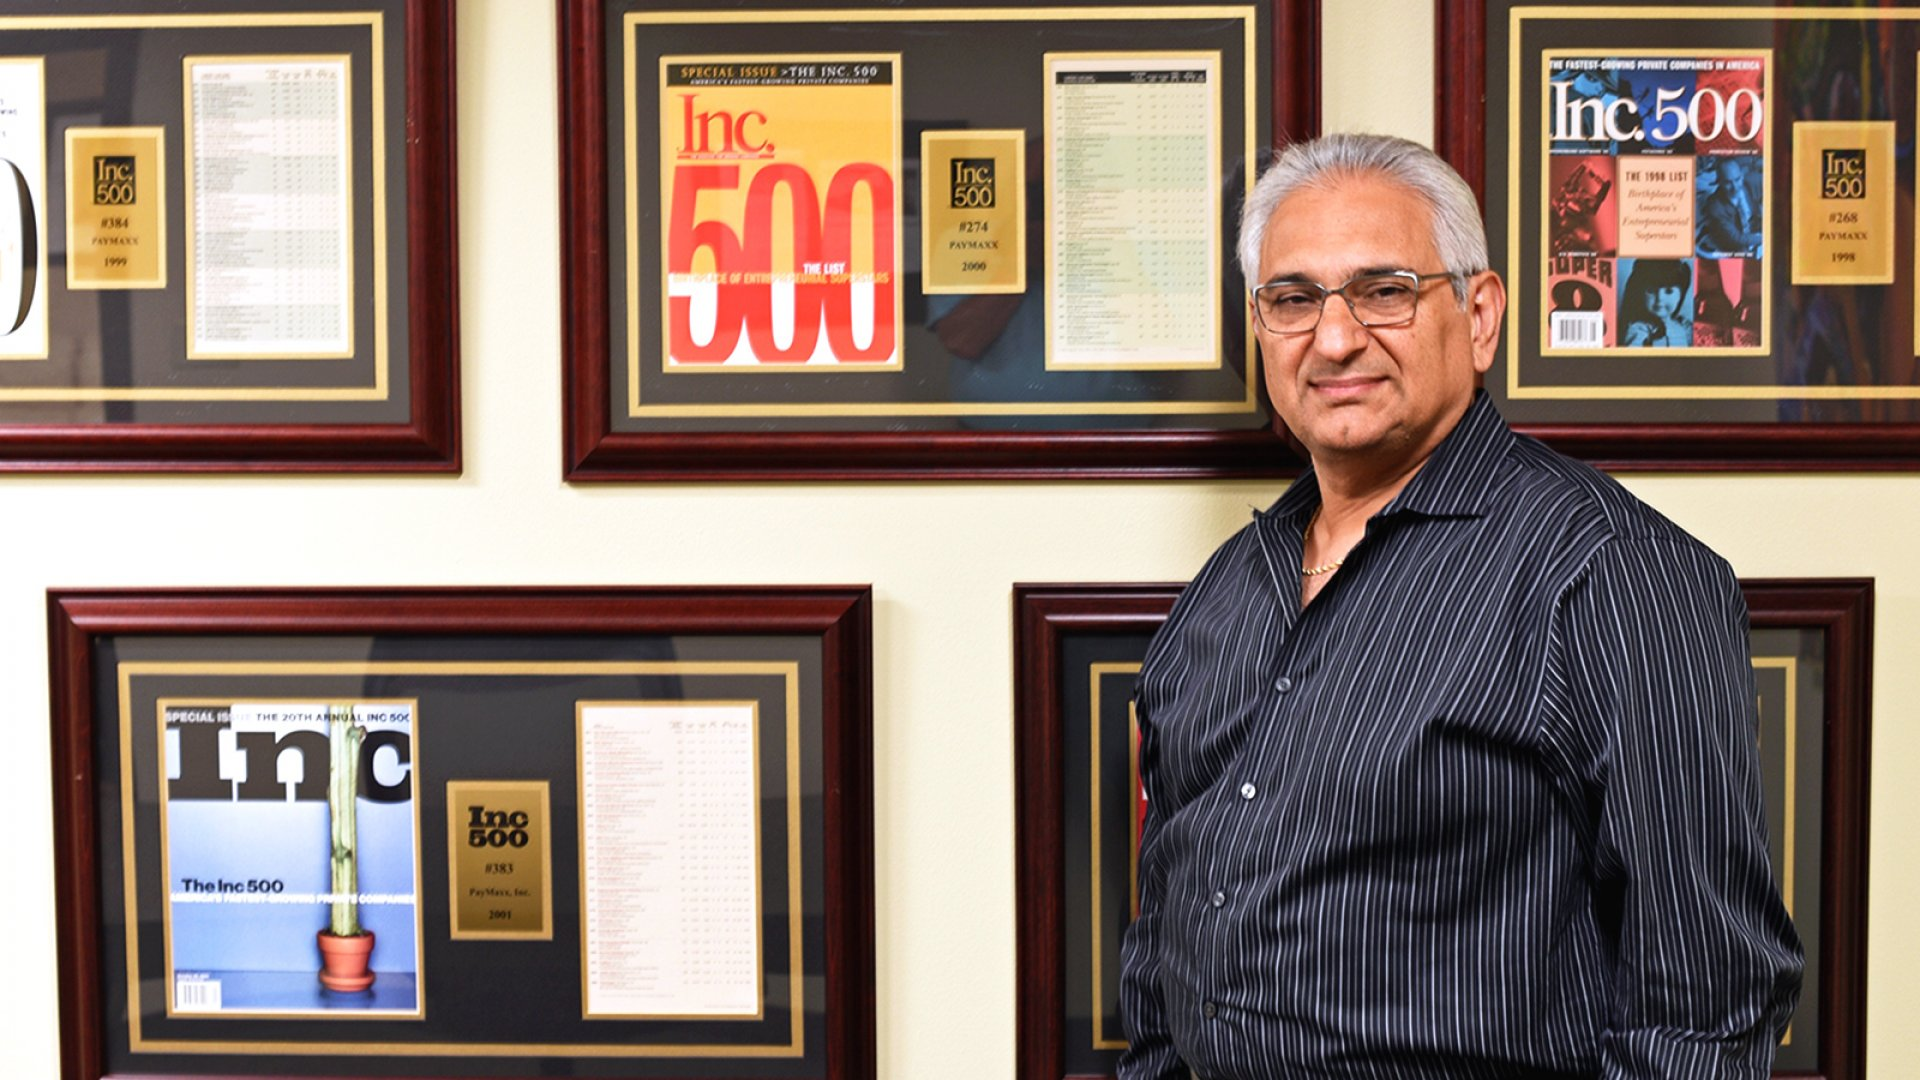 Farsheed Ferdowsi, CEO of Inova Payroll based in Nashville.